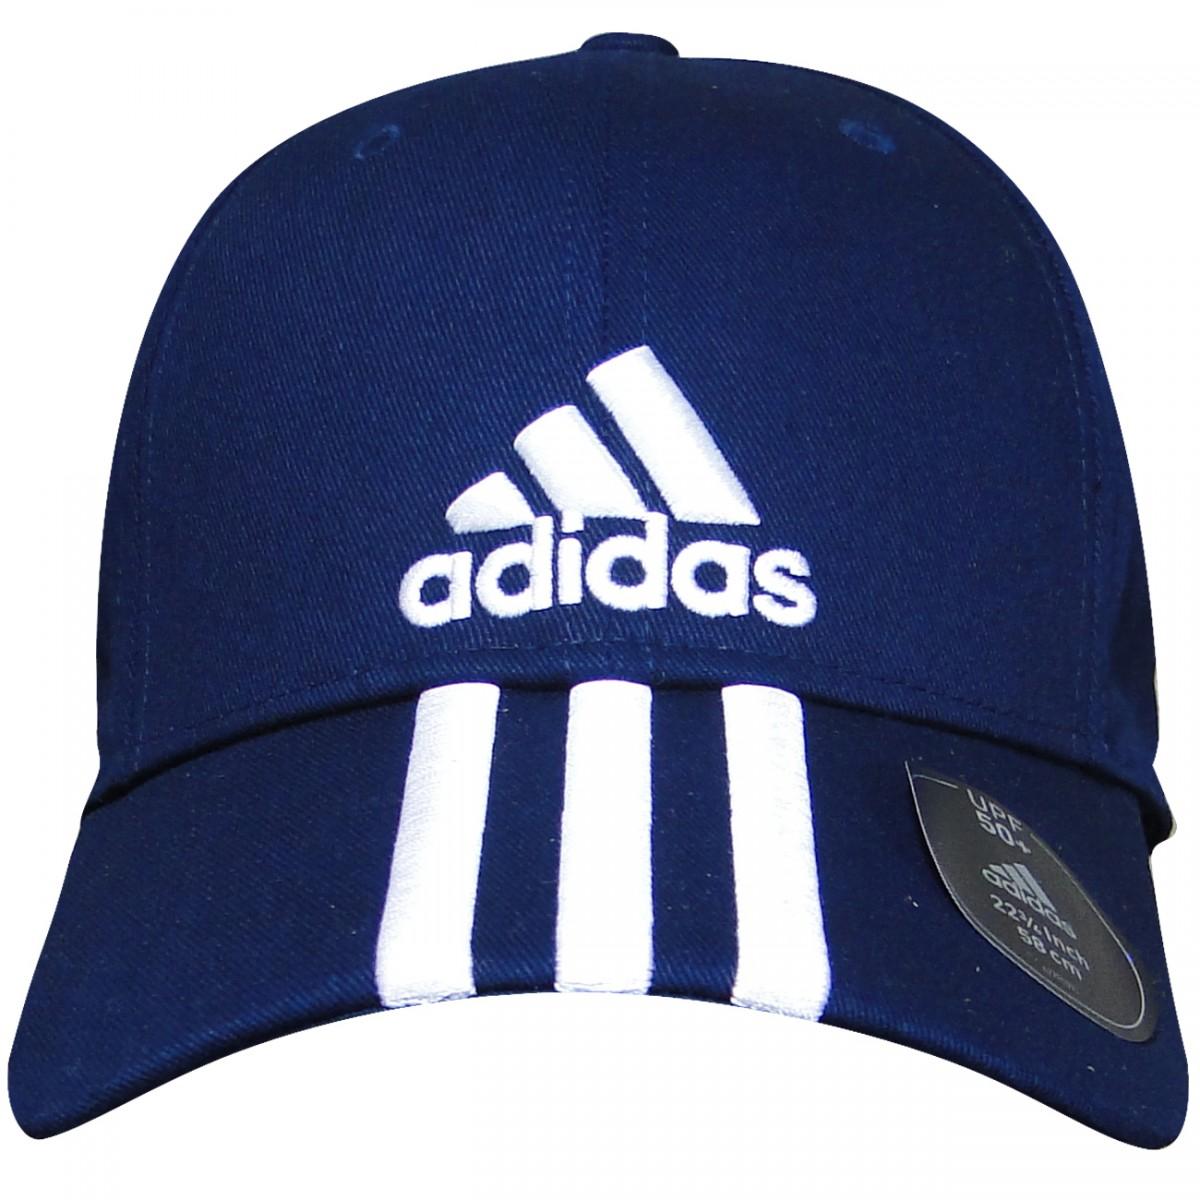 Bone Adidas Perf Cap 3S AJ9221 - Marinho Branco - Chuteira Nike ... f0106939cf8